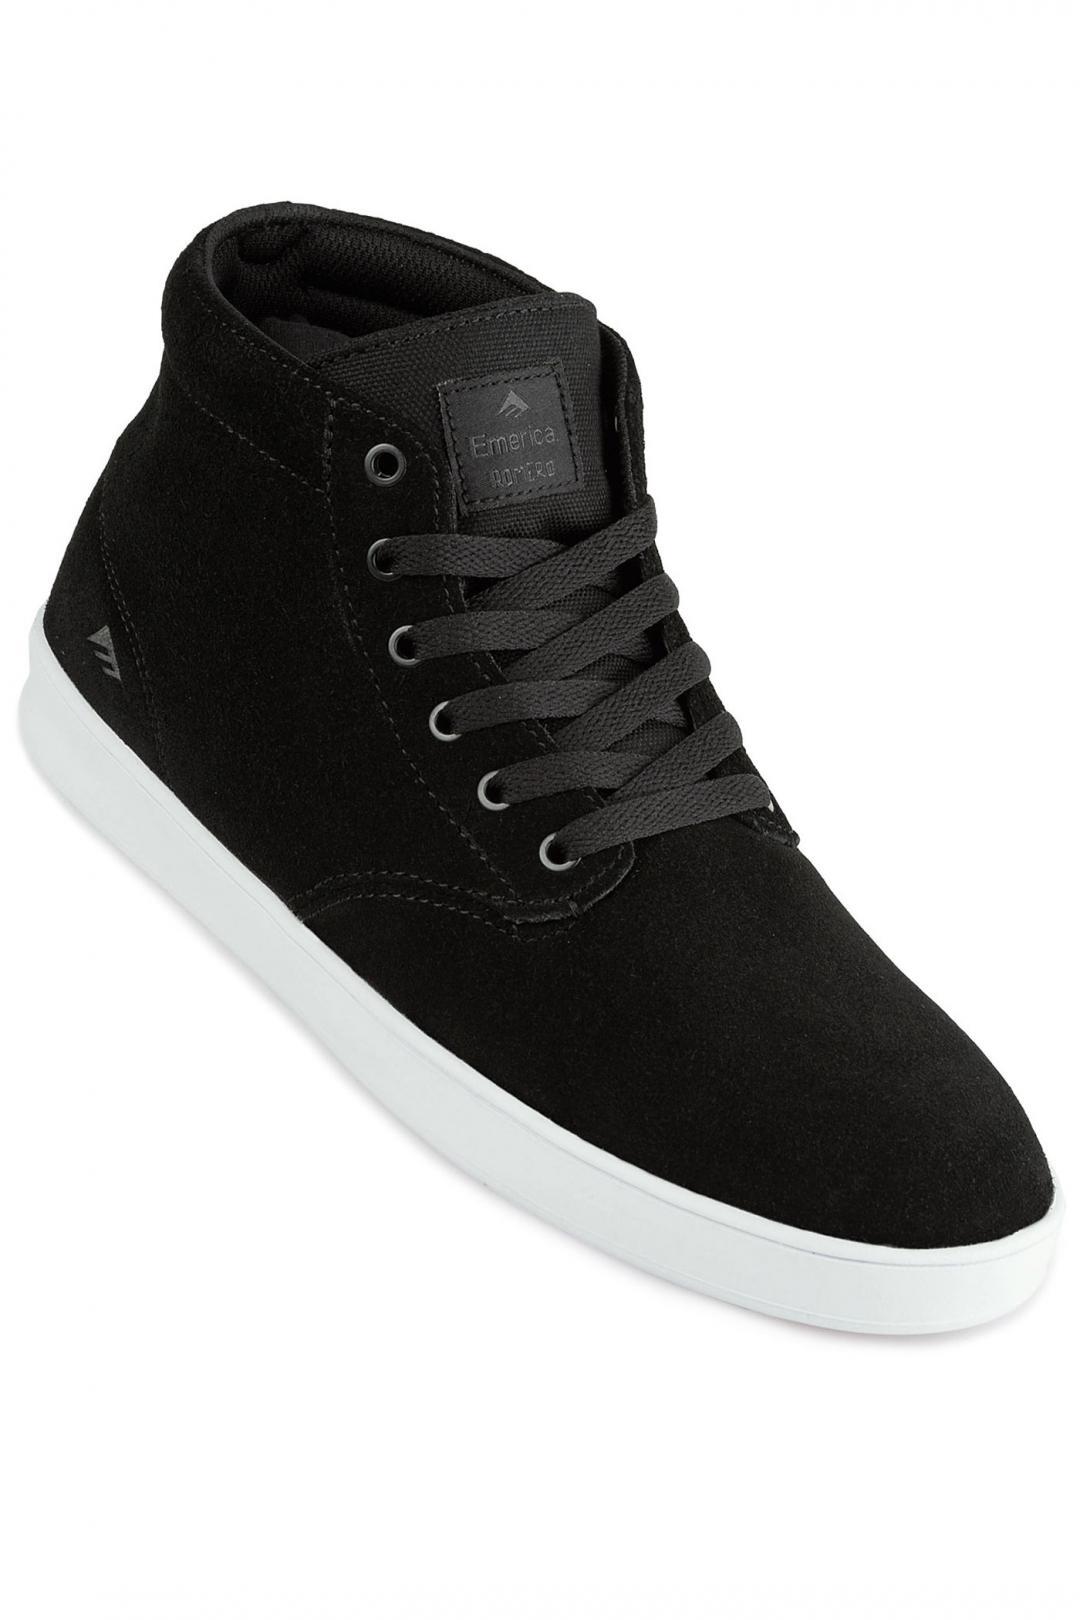 Uomo Emerica Romero Laced High black white   Sneakers high top